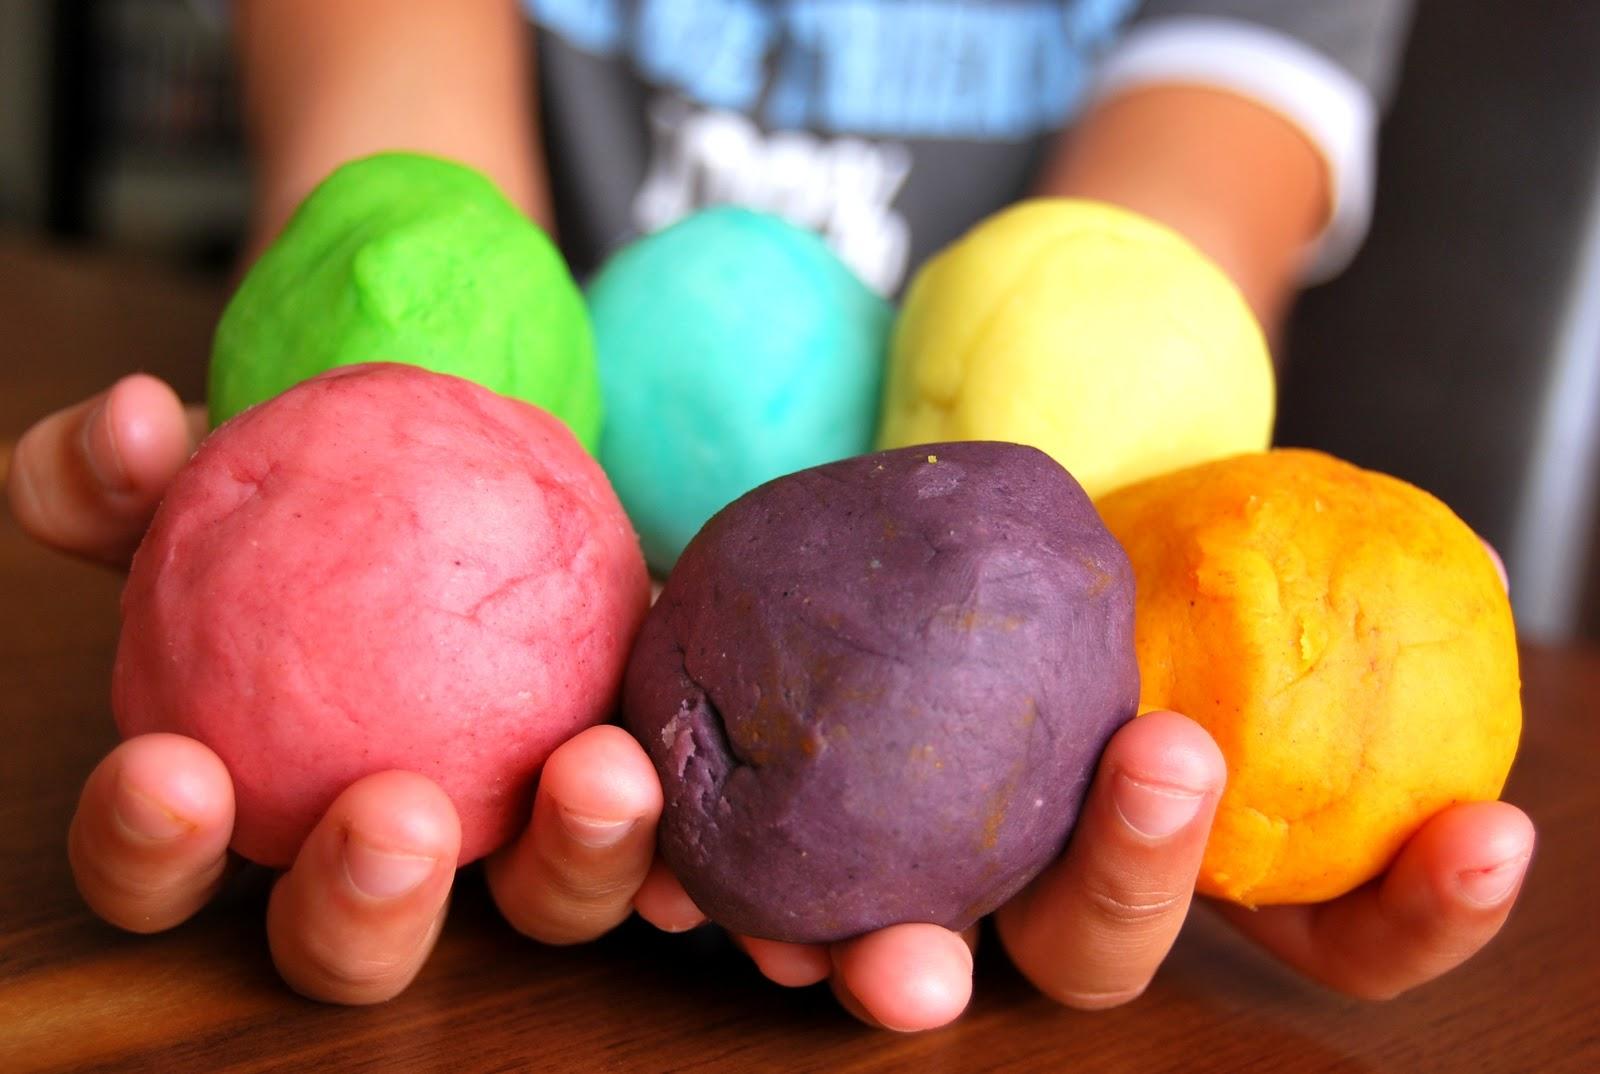 Le Grand Bazaar: La pâte à modeler homemade (Tuto inside) #billet récup#